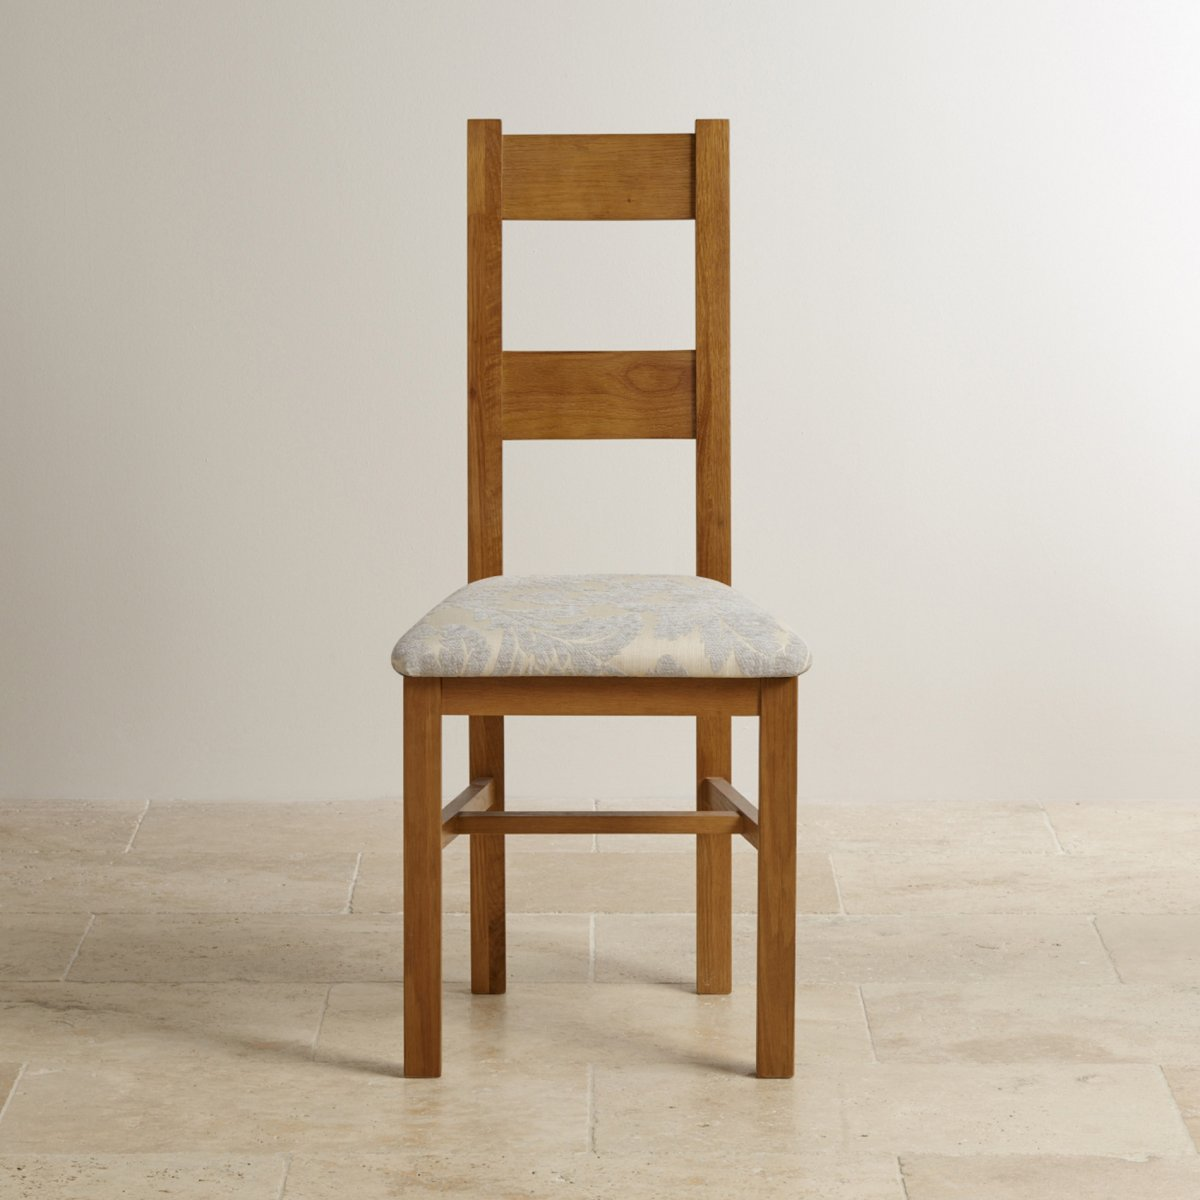 oak farmhouse chairs three legged chair antique rustic solid fabric dining grey